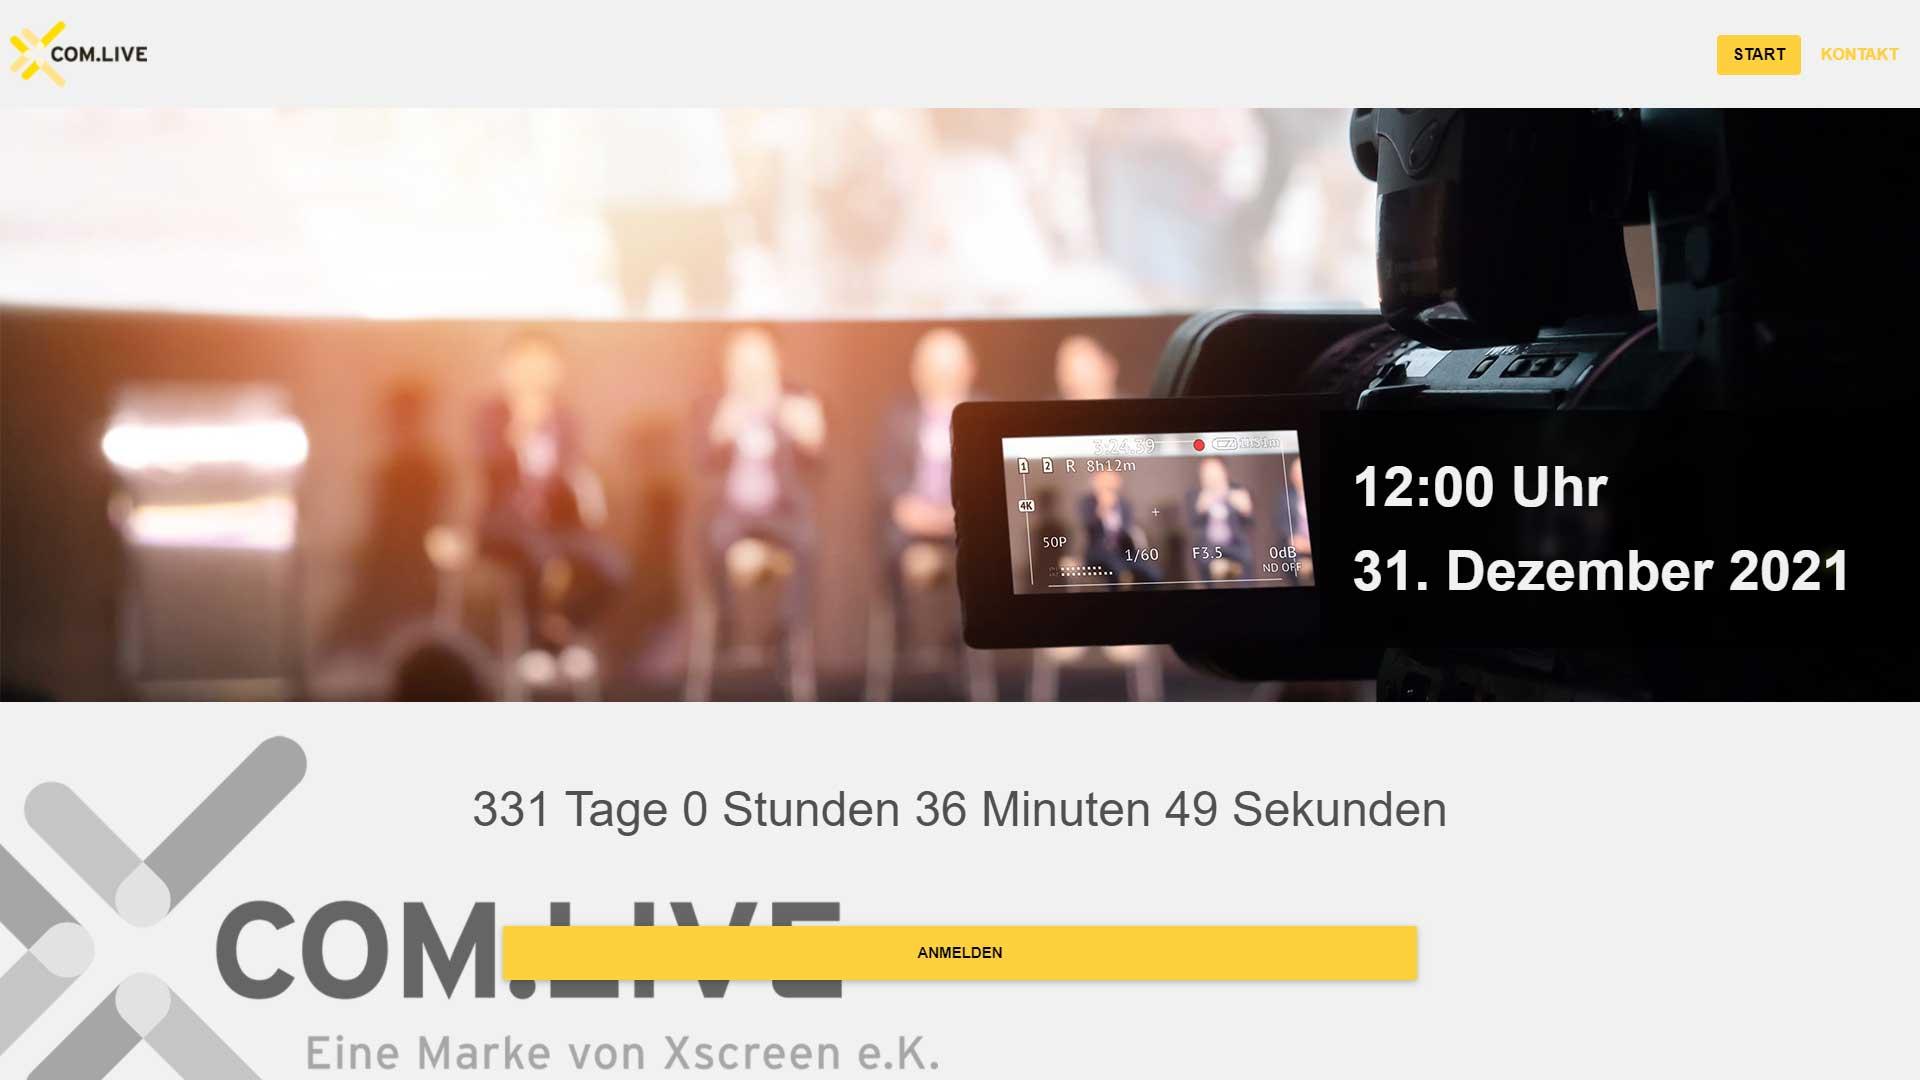 XCOM.live Online Location virtuelle und hybride Events